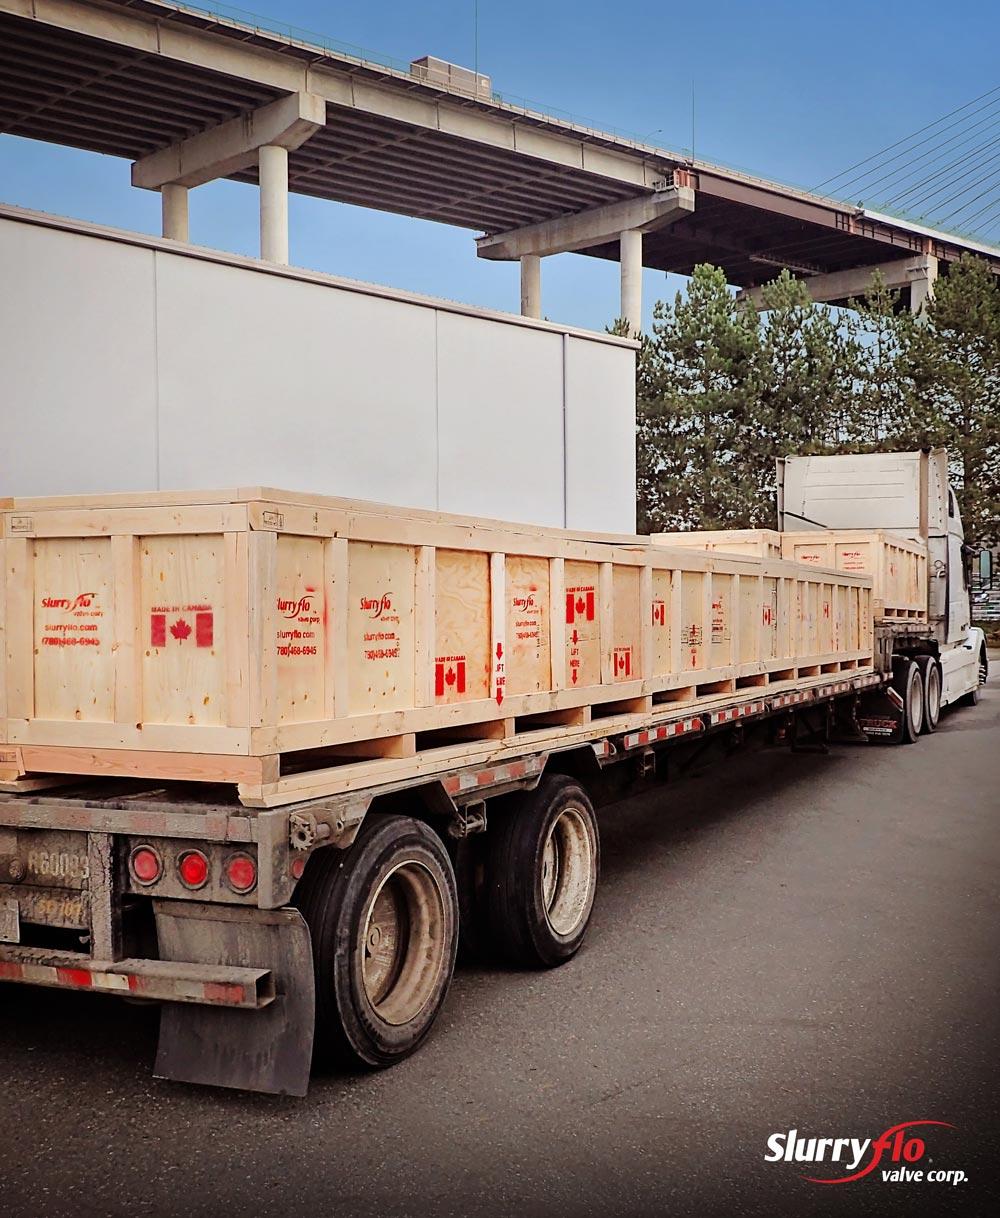 SlurryFlo control valve shipments